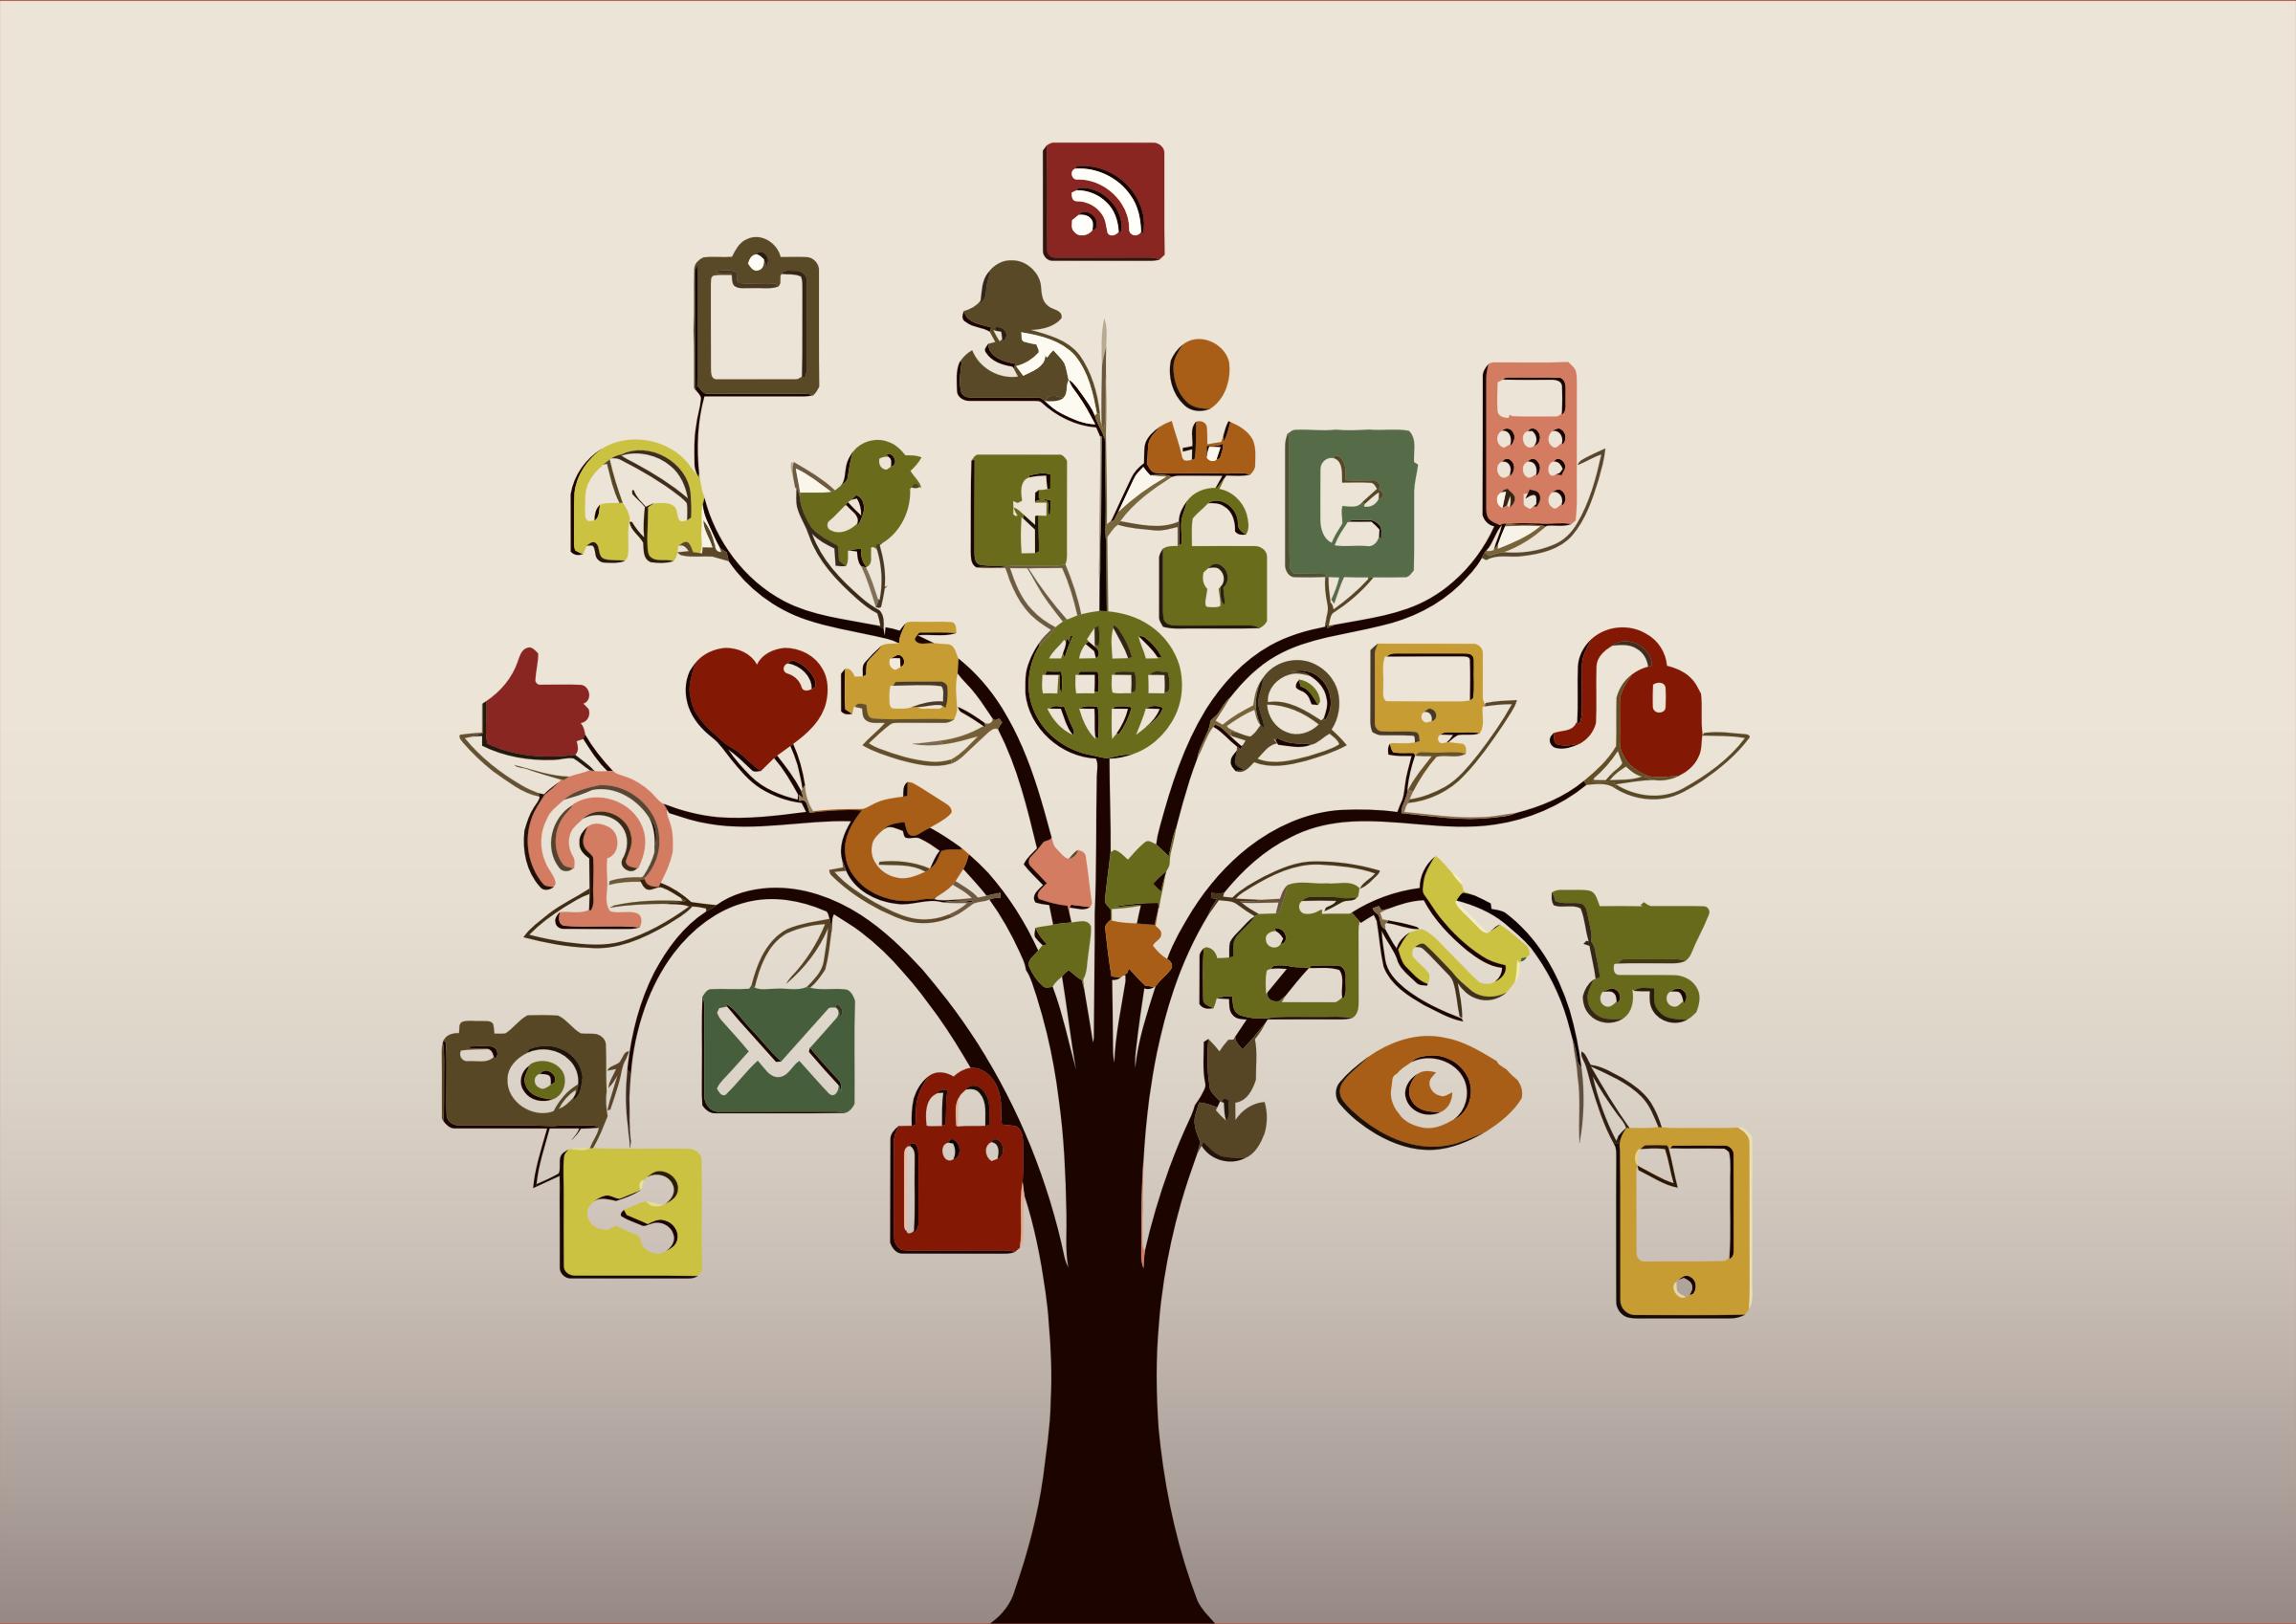 Social media clipart png vector royalty free library Clipart - Social Media Tree vector royalty free library